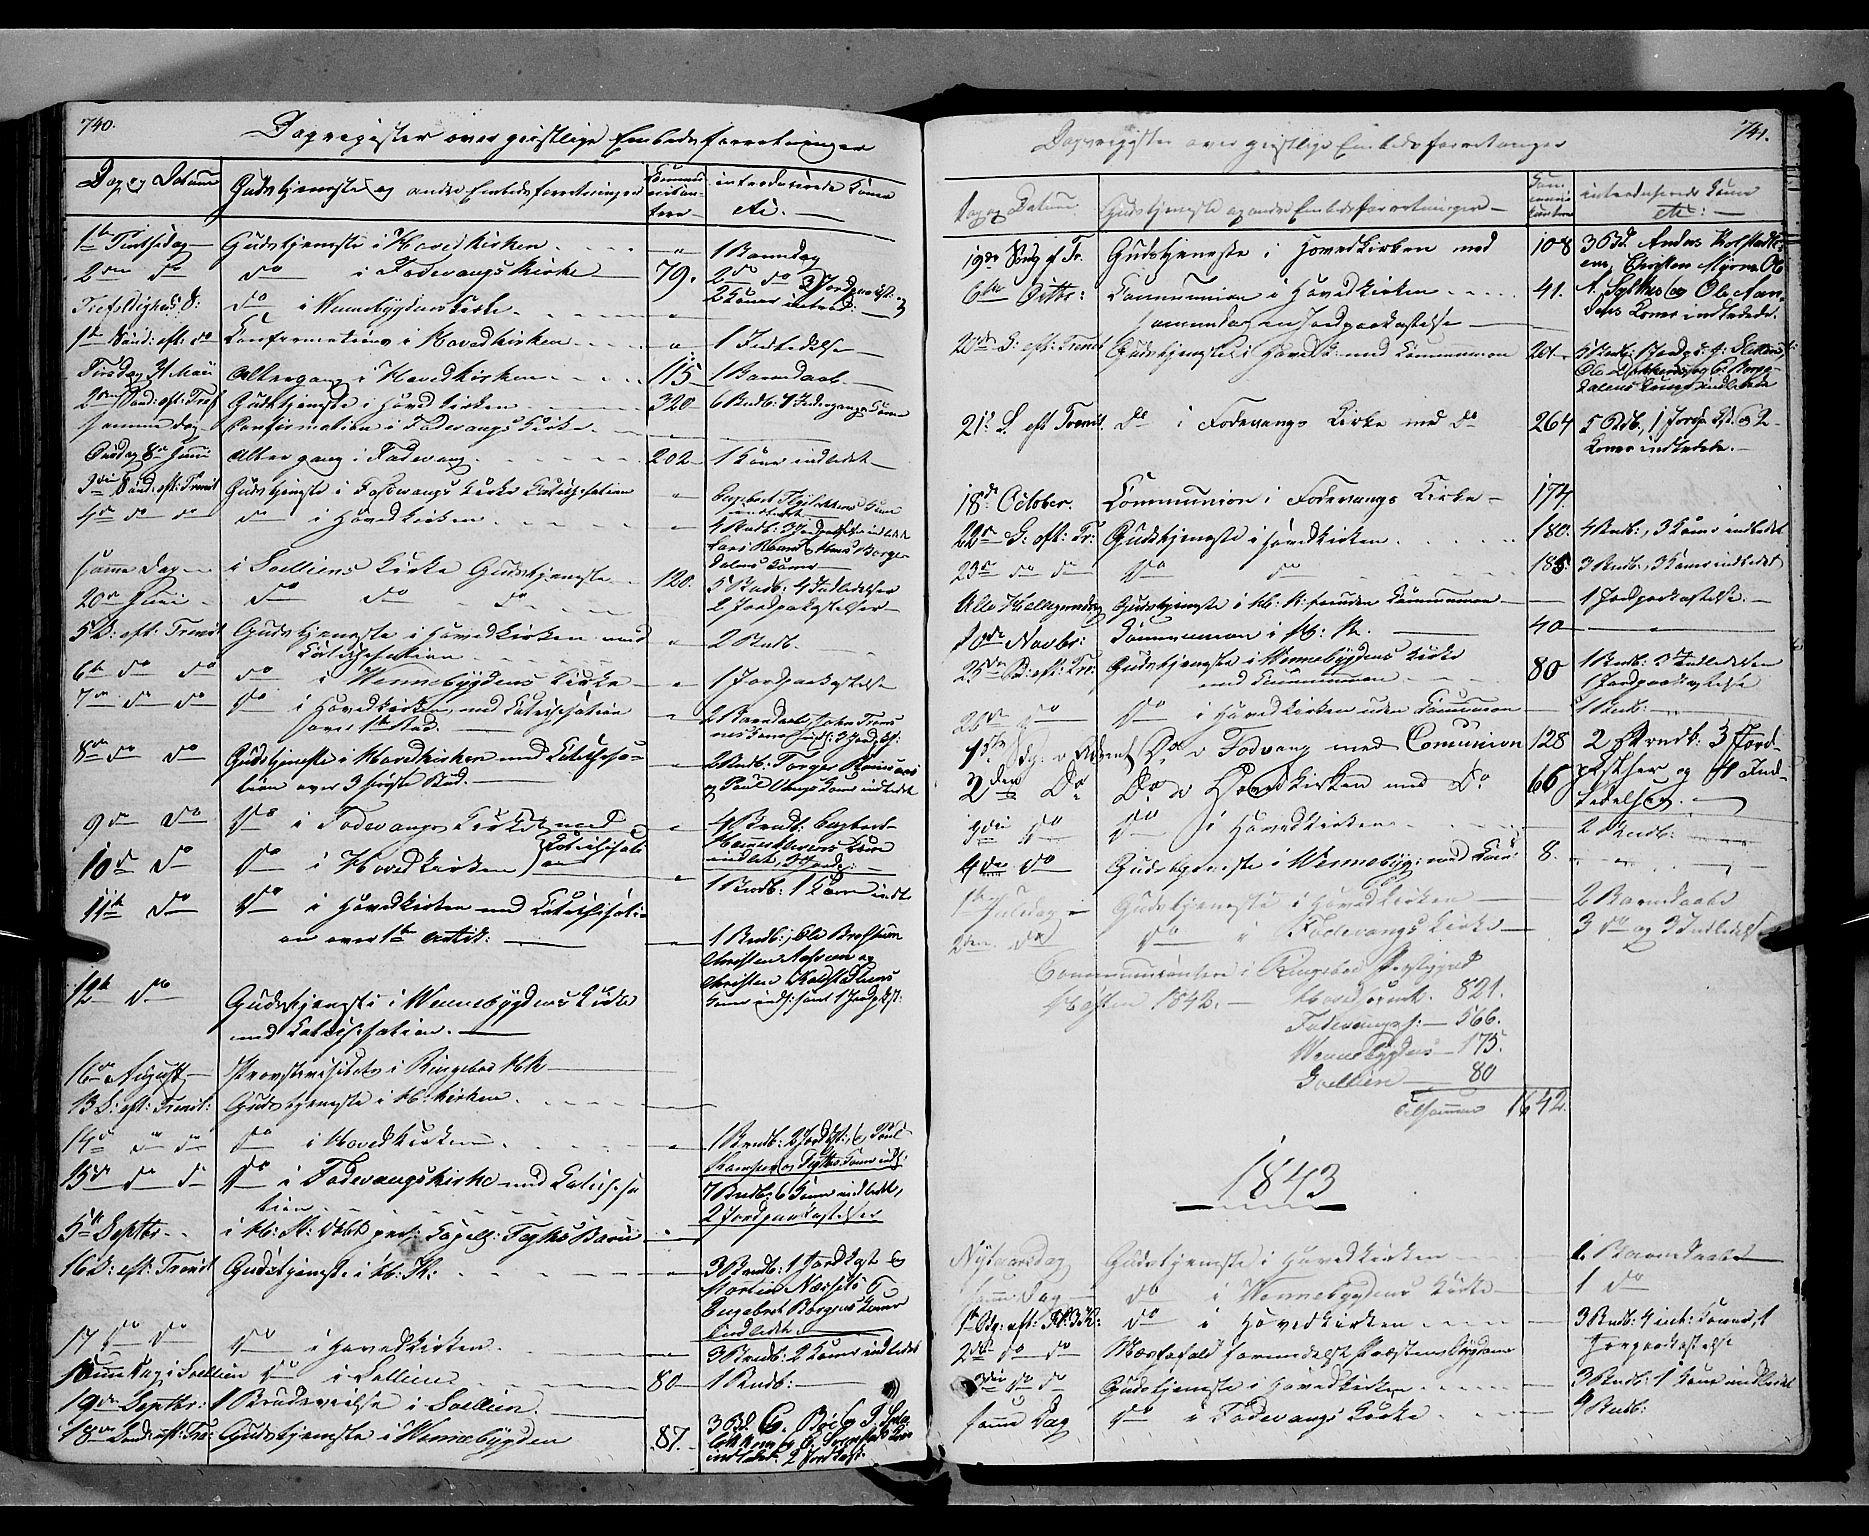 SAH, Ringebu prestekontor, Ministerialbok nr. 5, 1839-1848, s. 740-741